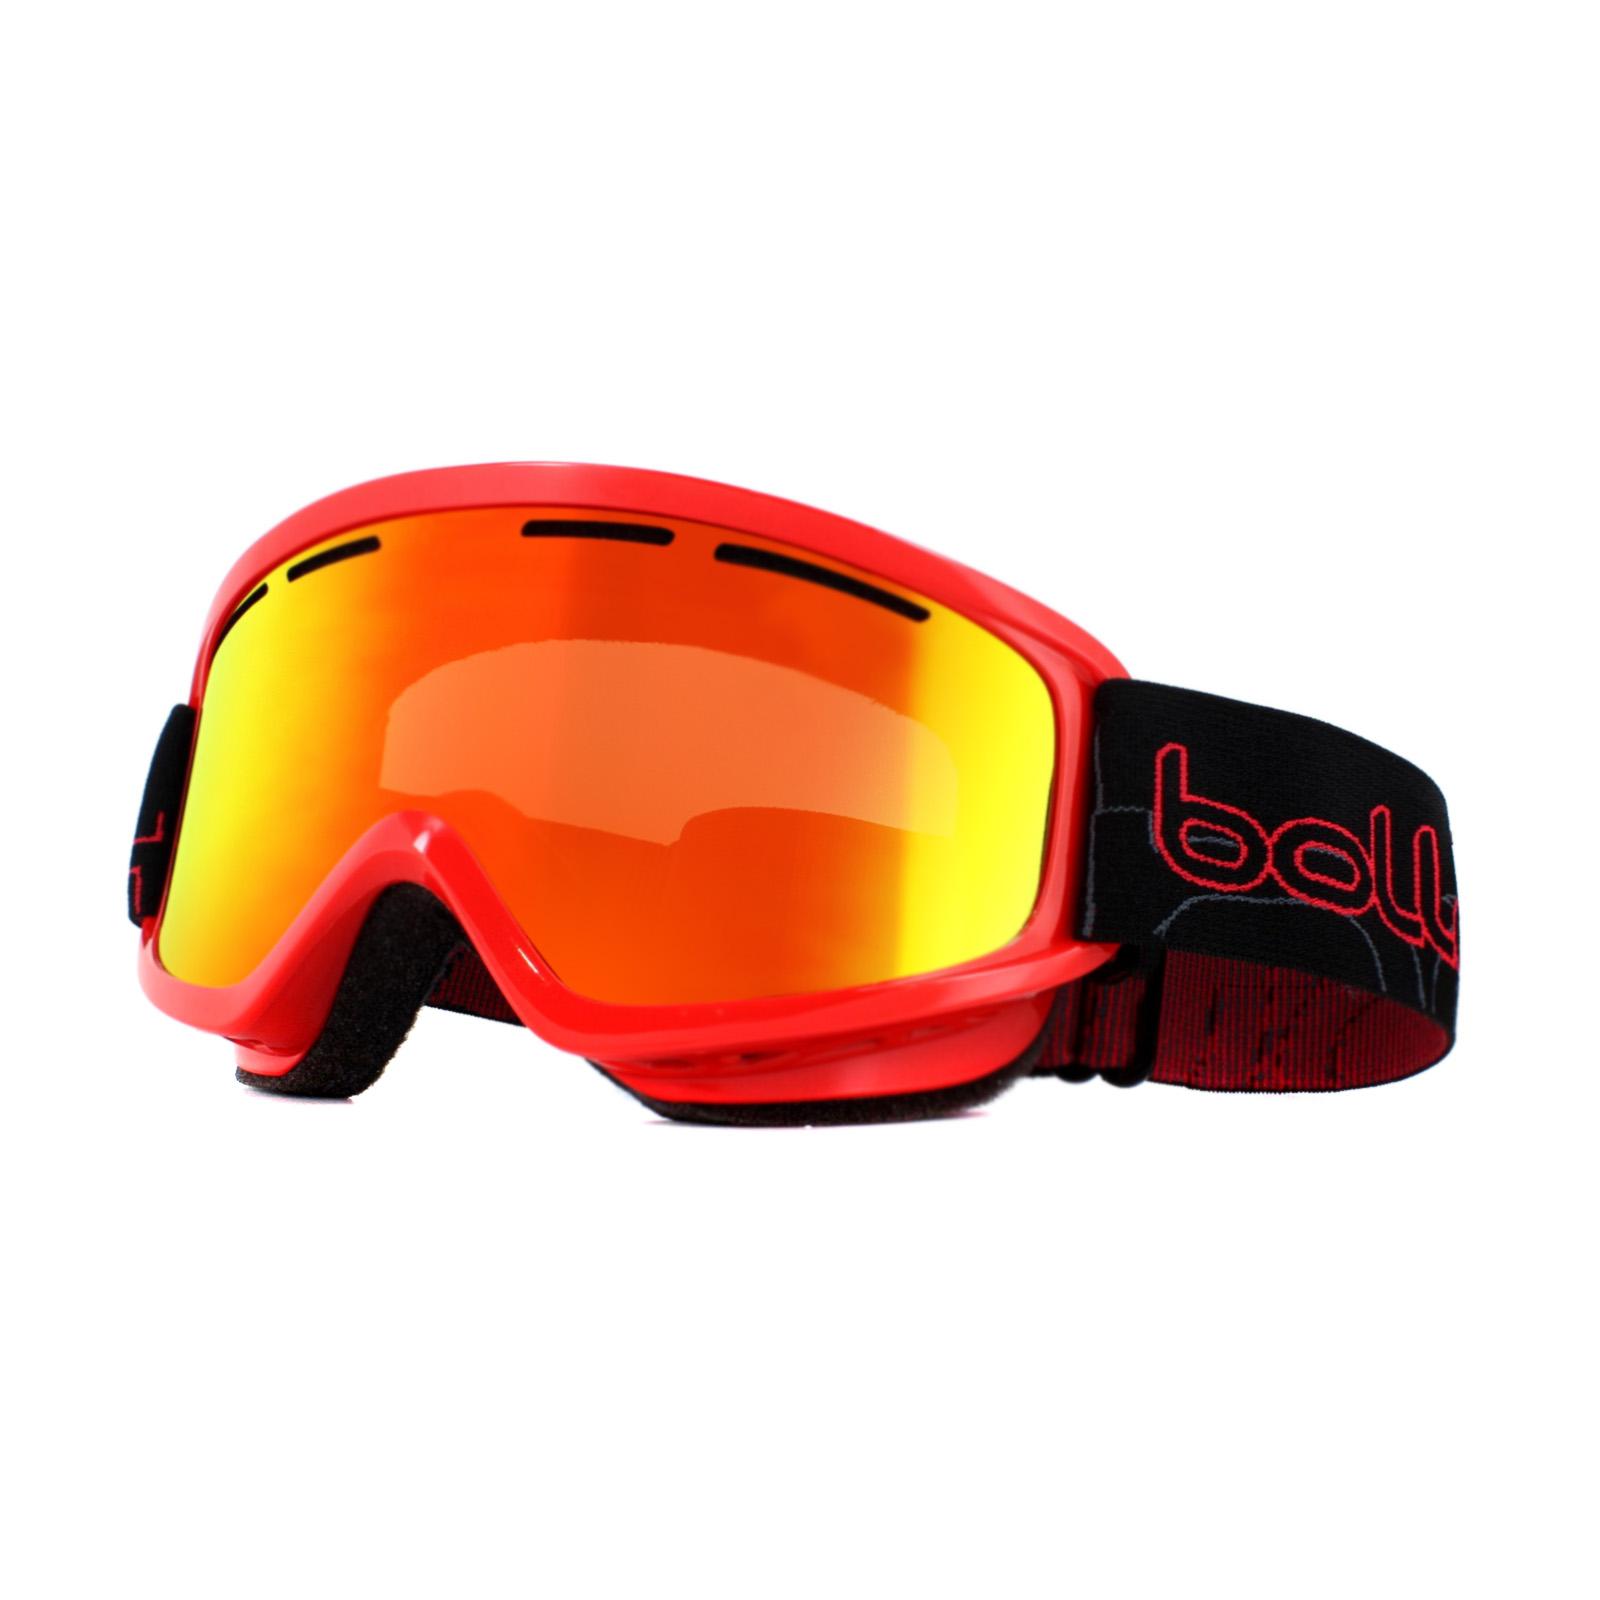 684184e1376 Sentinel Bolle Ski Goggles Schuss 21481 Shiny Red Sunrise